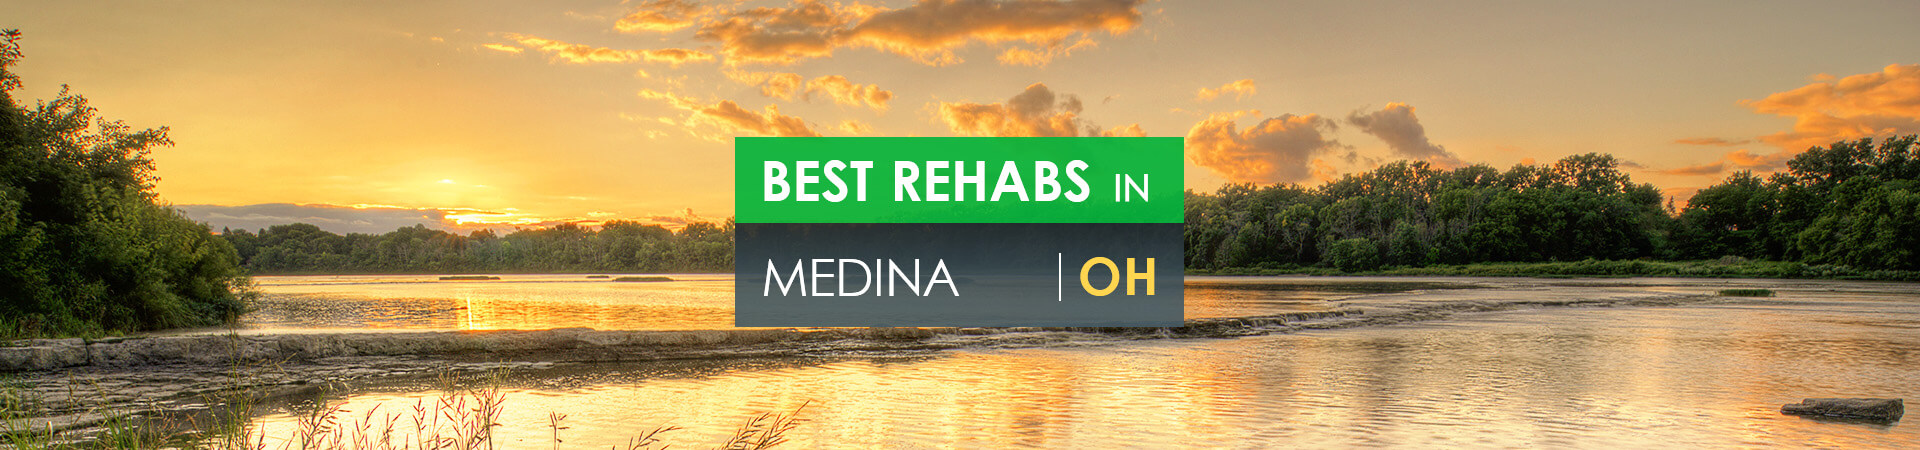 Best rehabs in Medina, OH